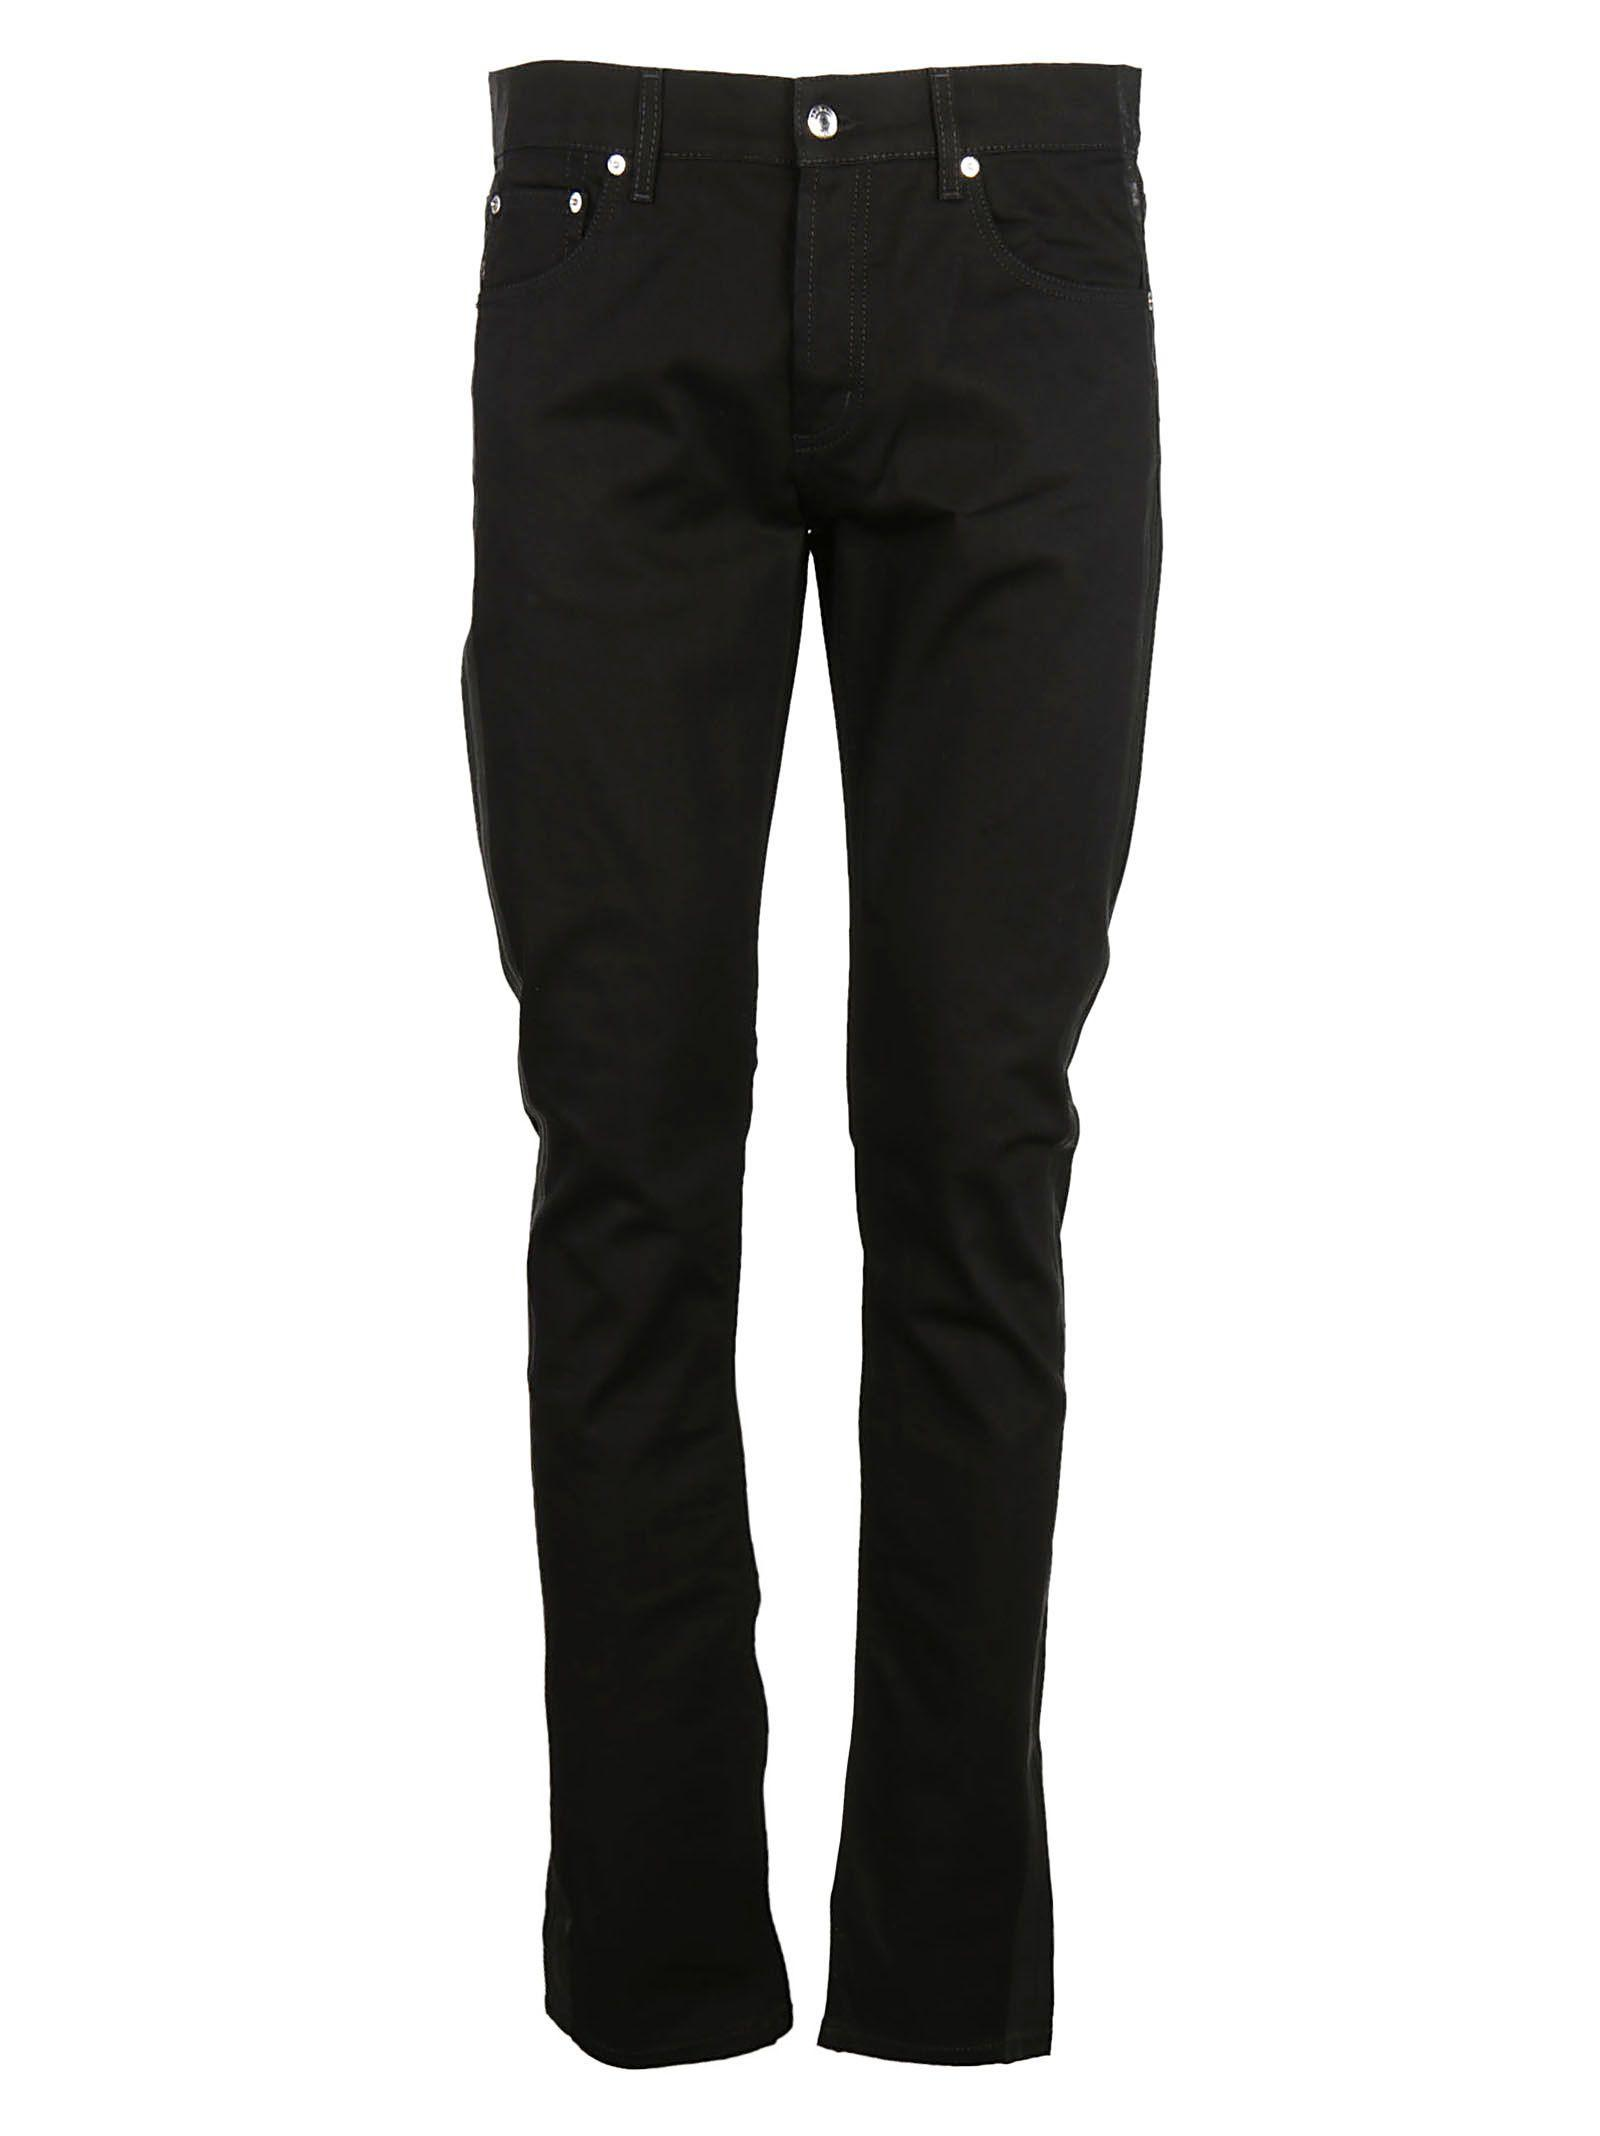 Alexander Mcqueen Classic Skinny Jeans In Black